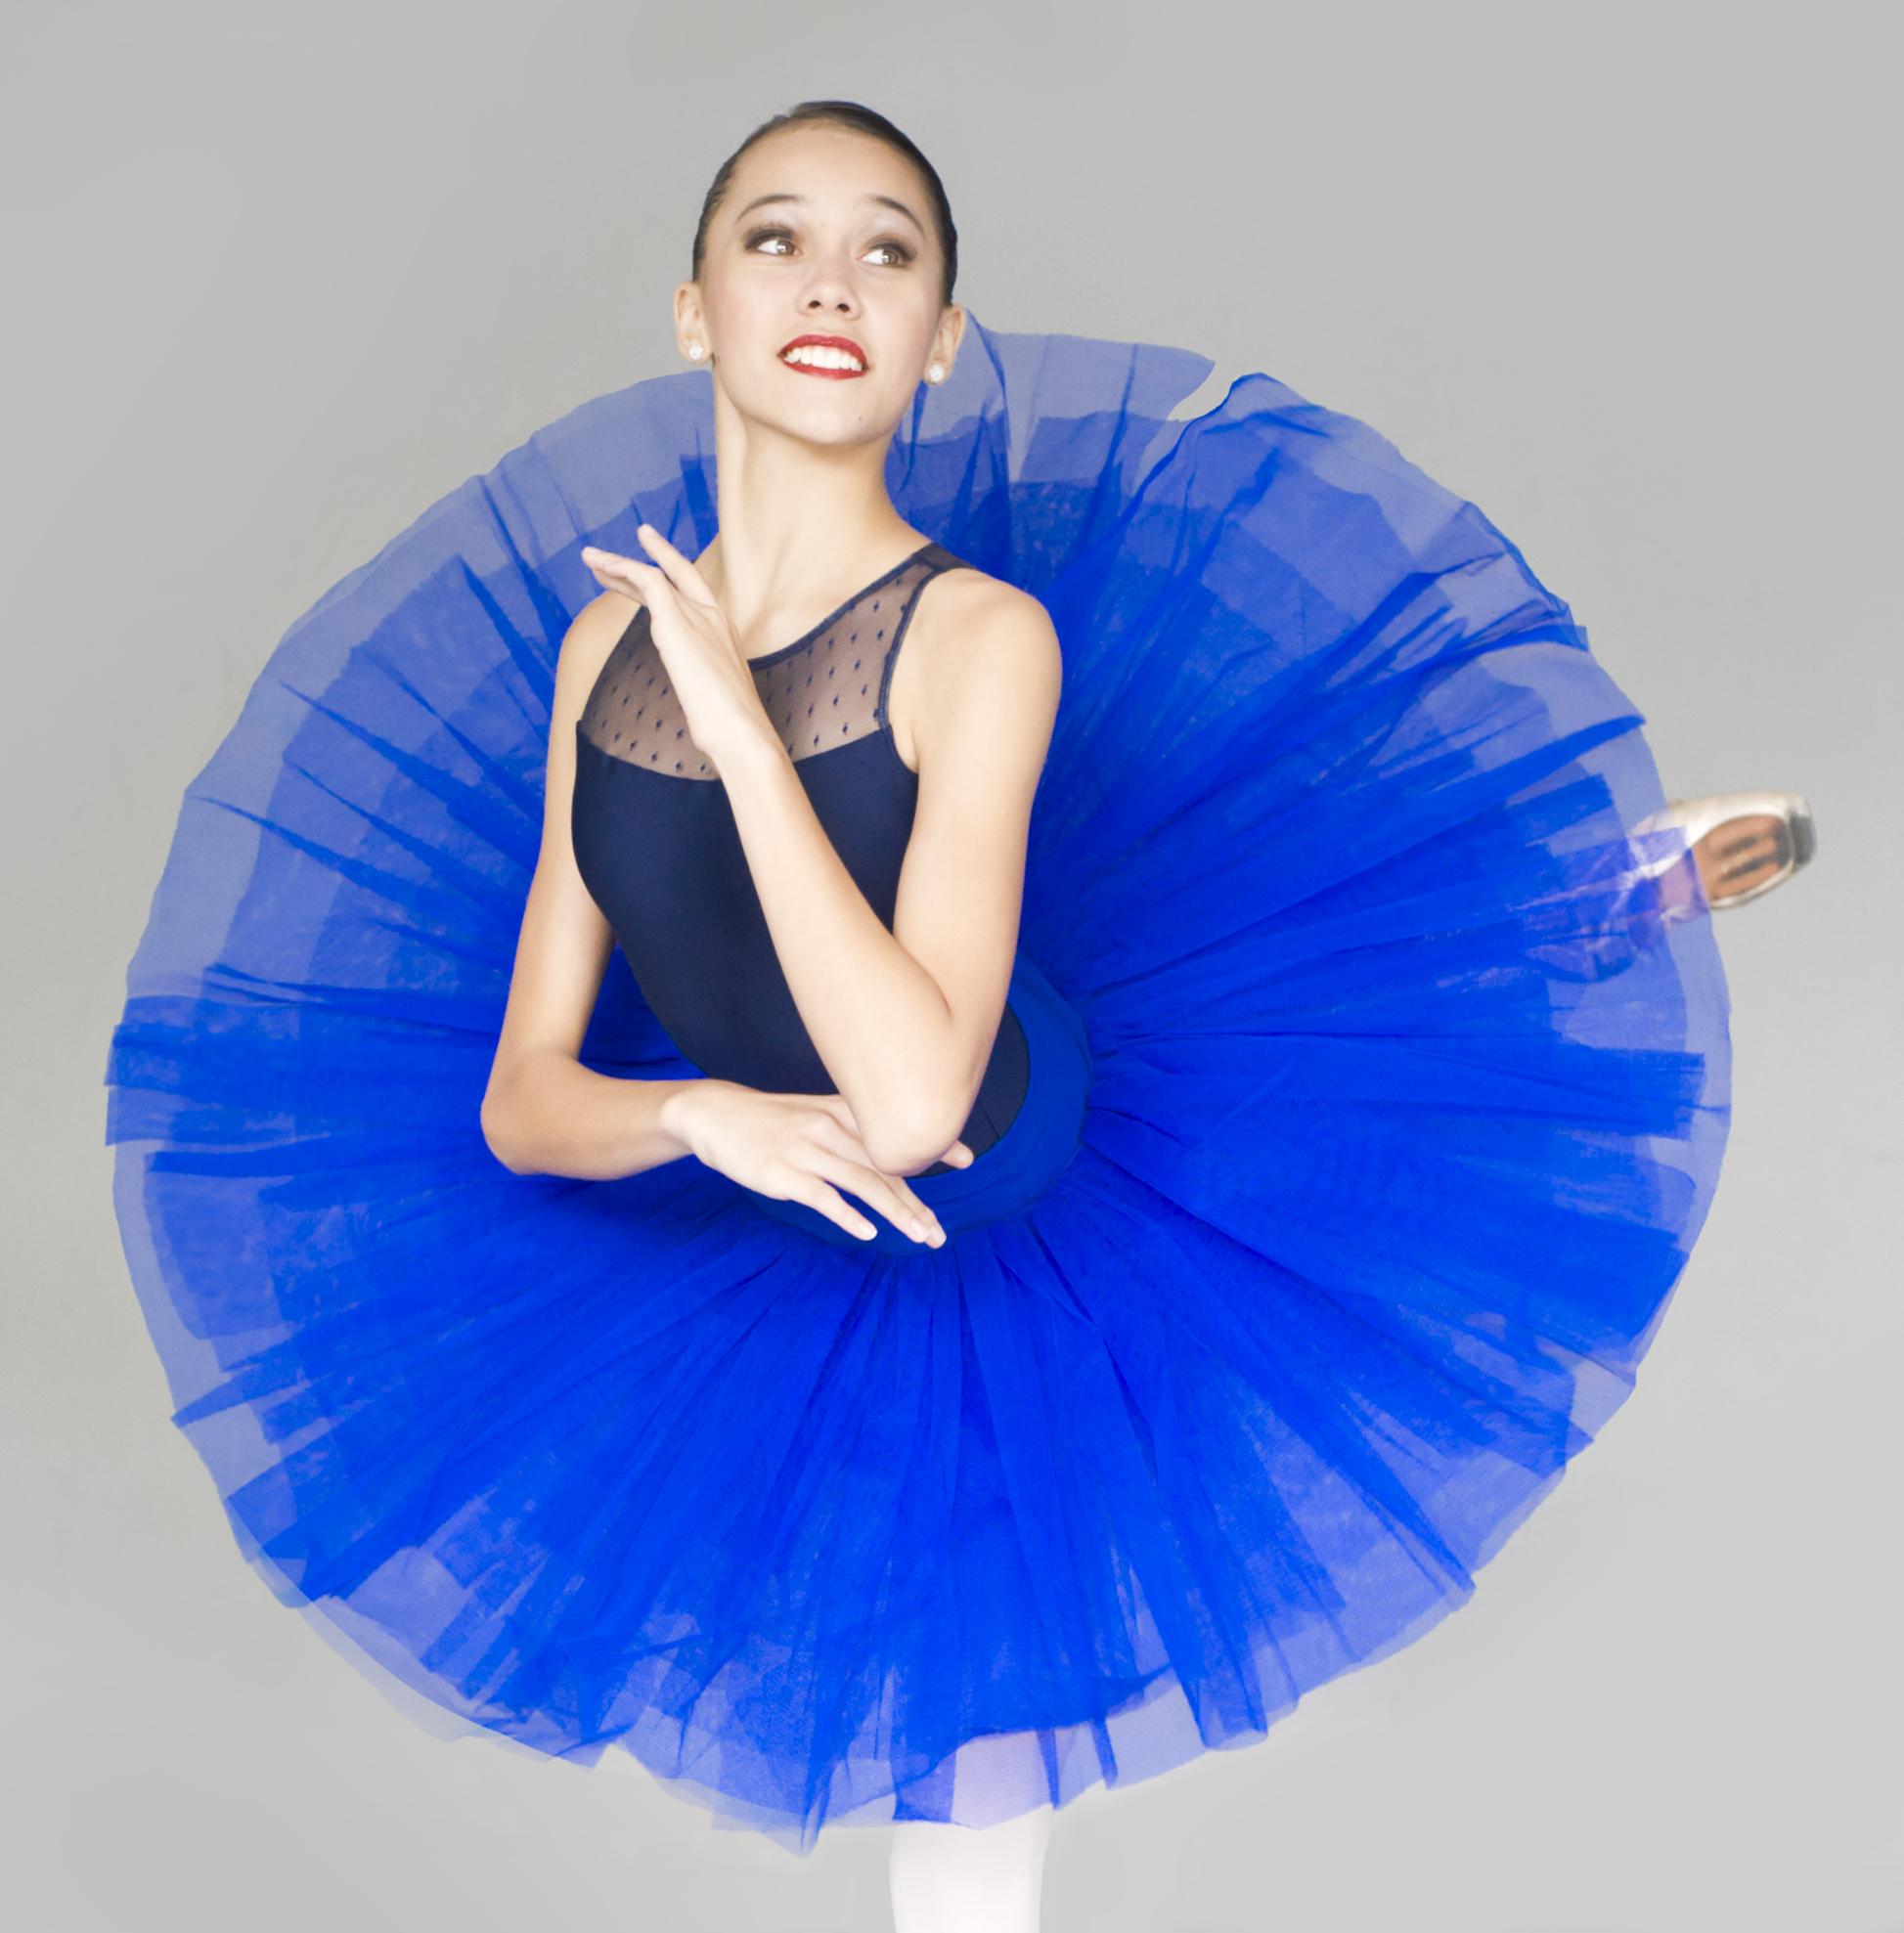 Phebe Nguyen-Kovaks for Balletlove.co